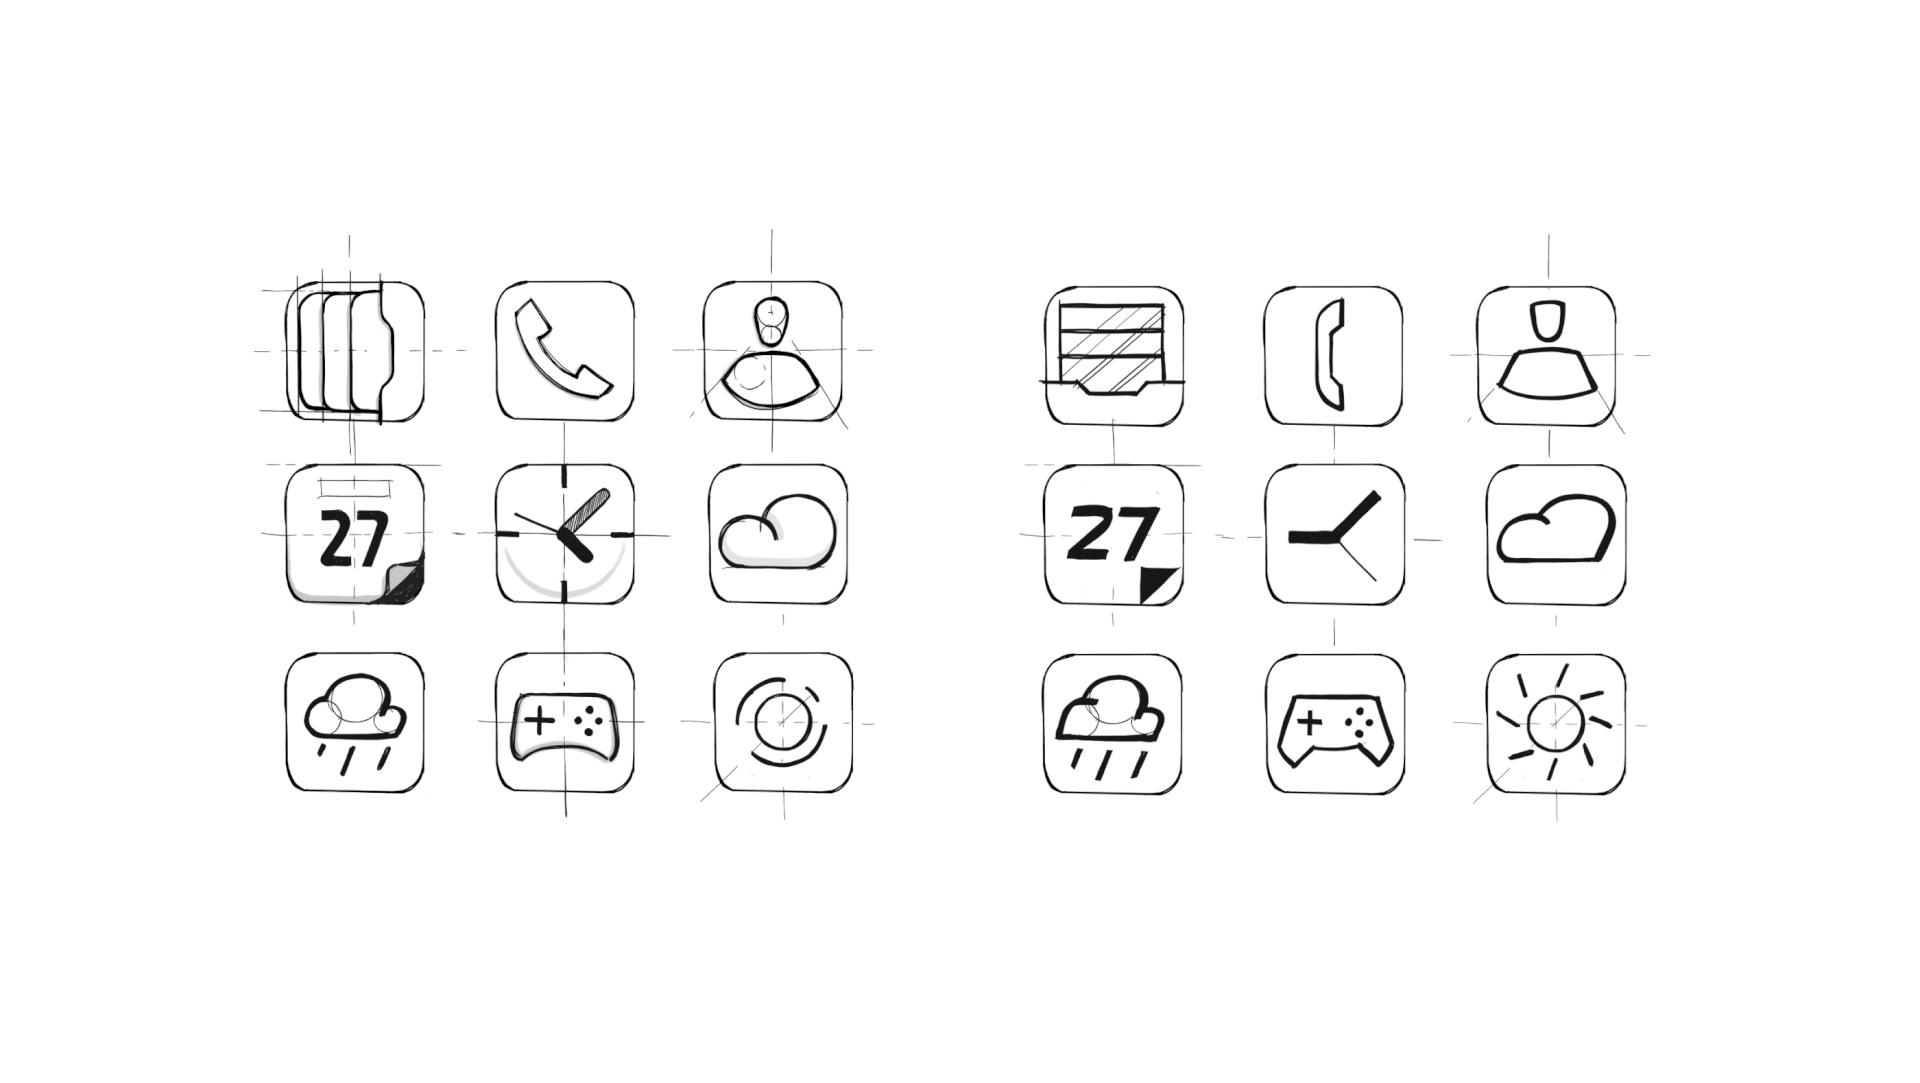 HUAWEI_EMUI_icons_tubik design sketches